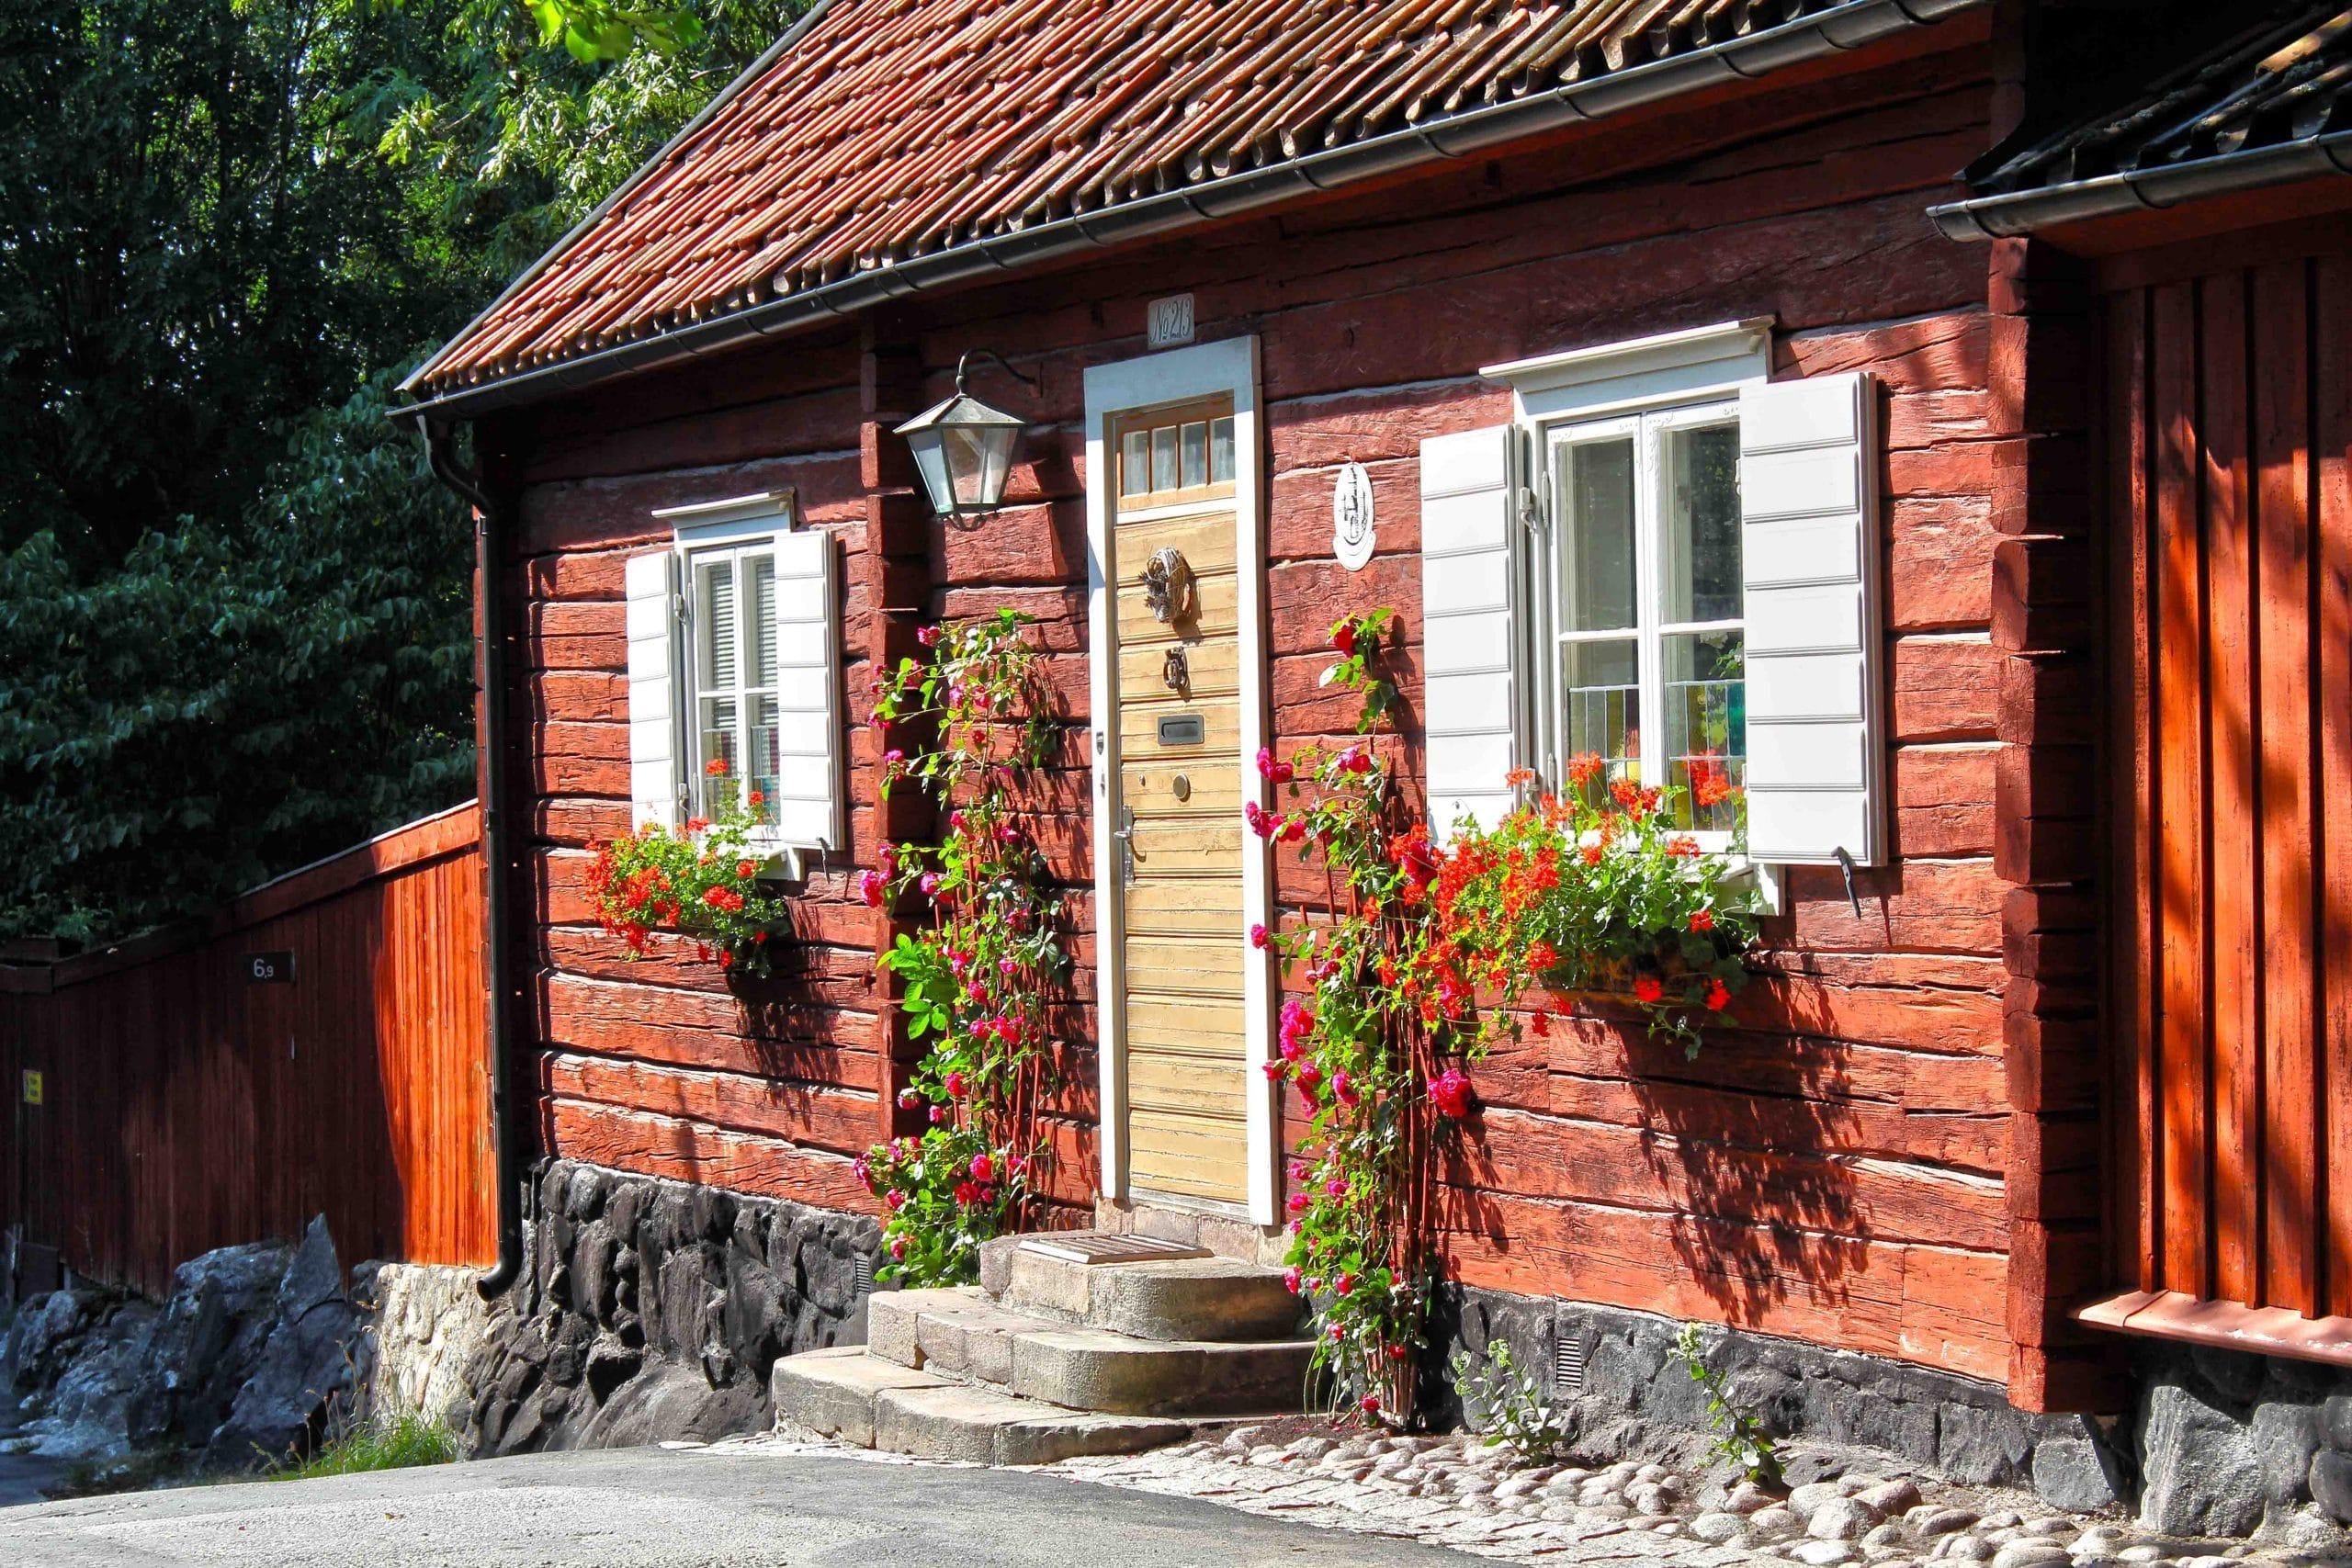 Stoccolma antica e bohémiènne